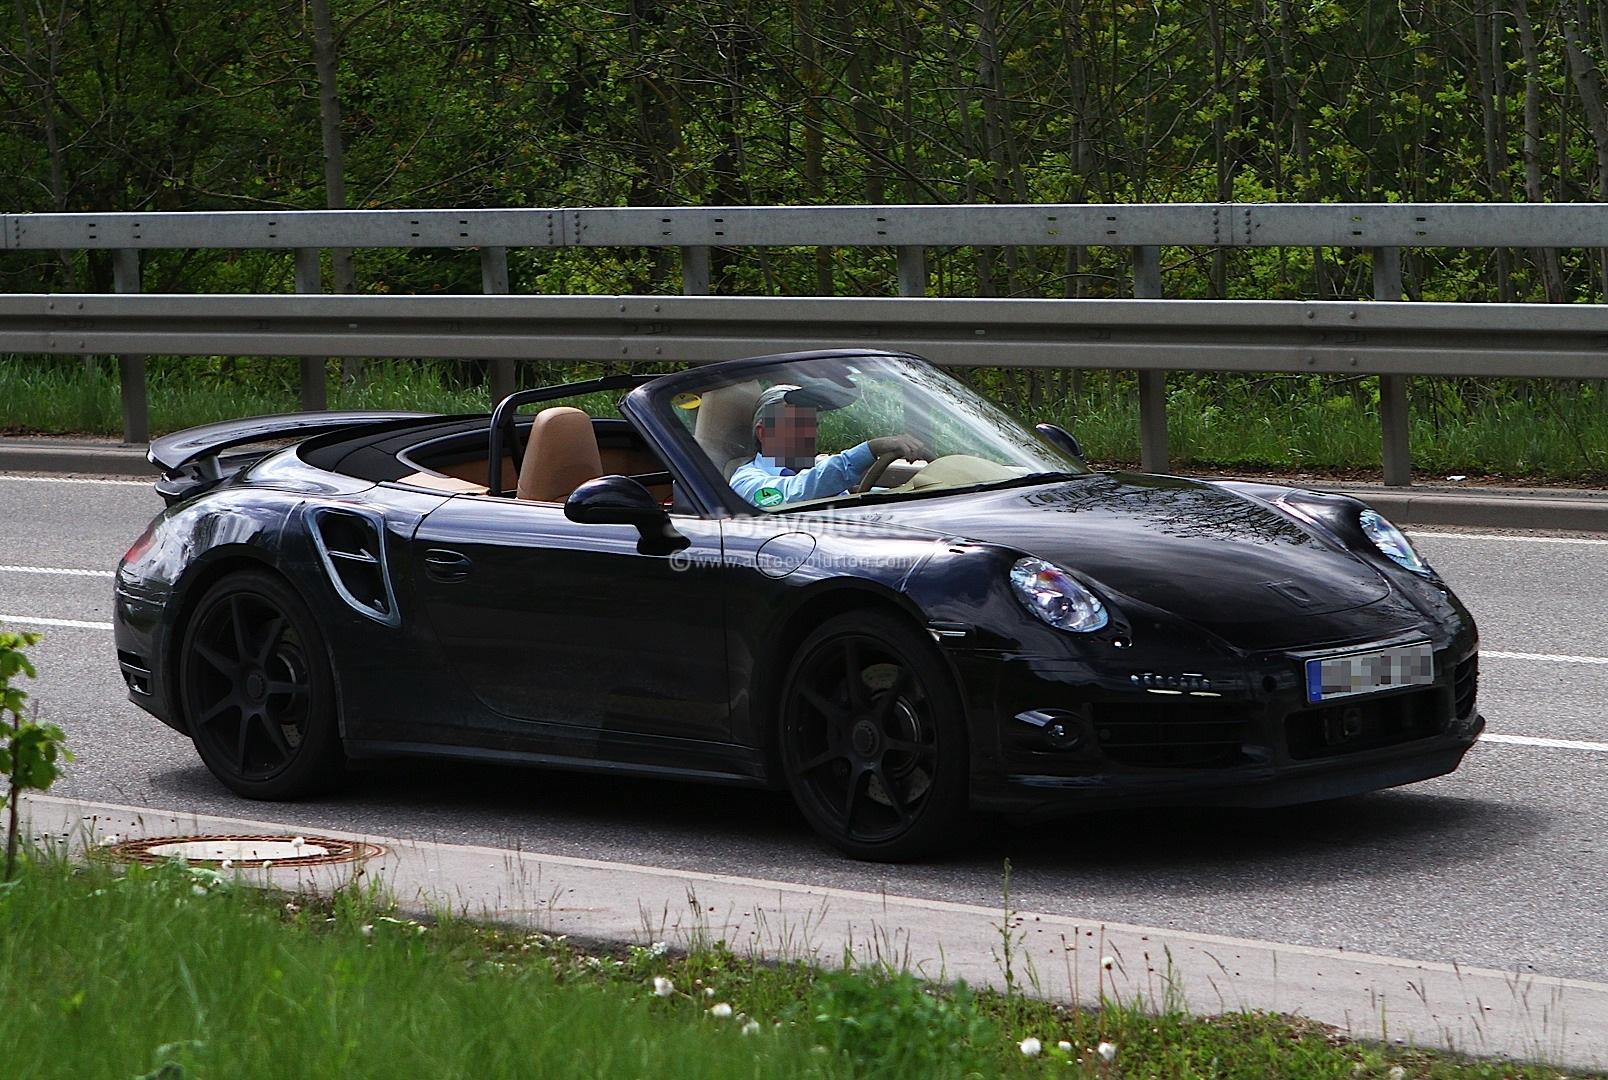 spyshots 2013 porsche 911 turbo cabriolet autoevolution. Black Bedroom Furniture Sets. Home Design Ideas